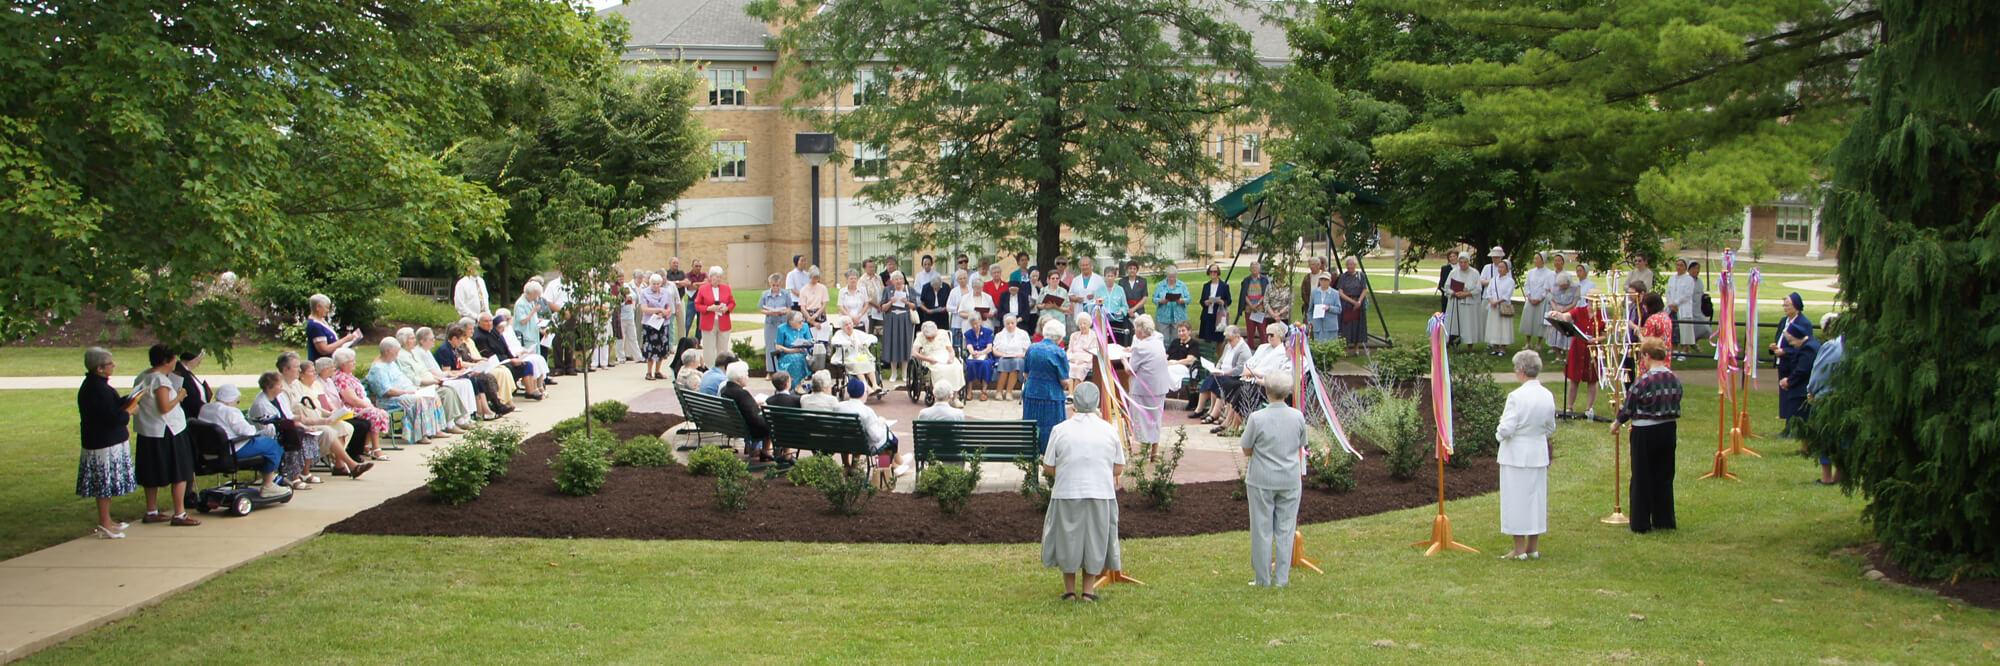 Sisters in prayer outside at Caritas Christi